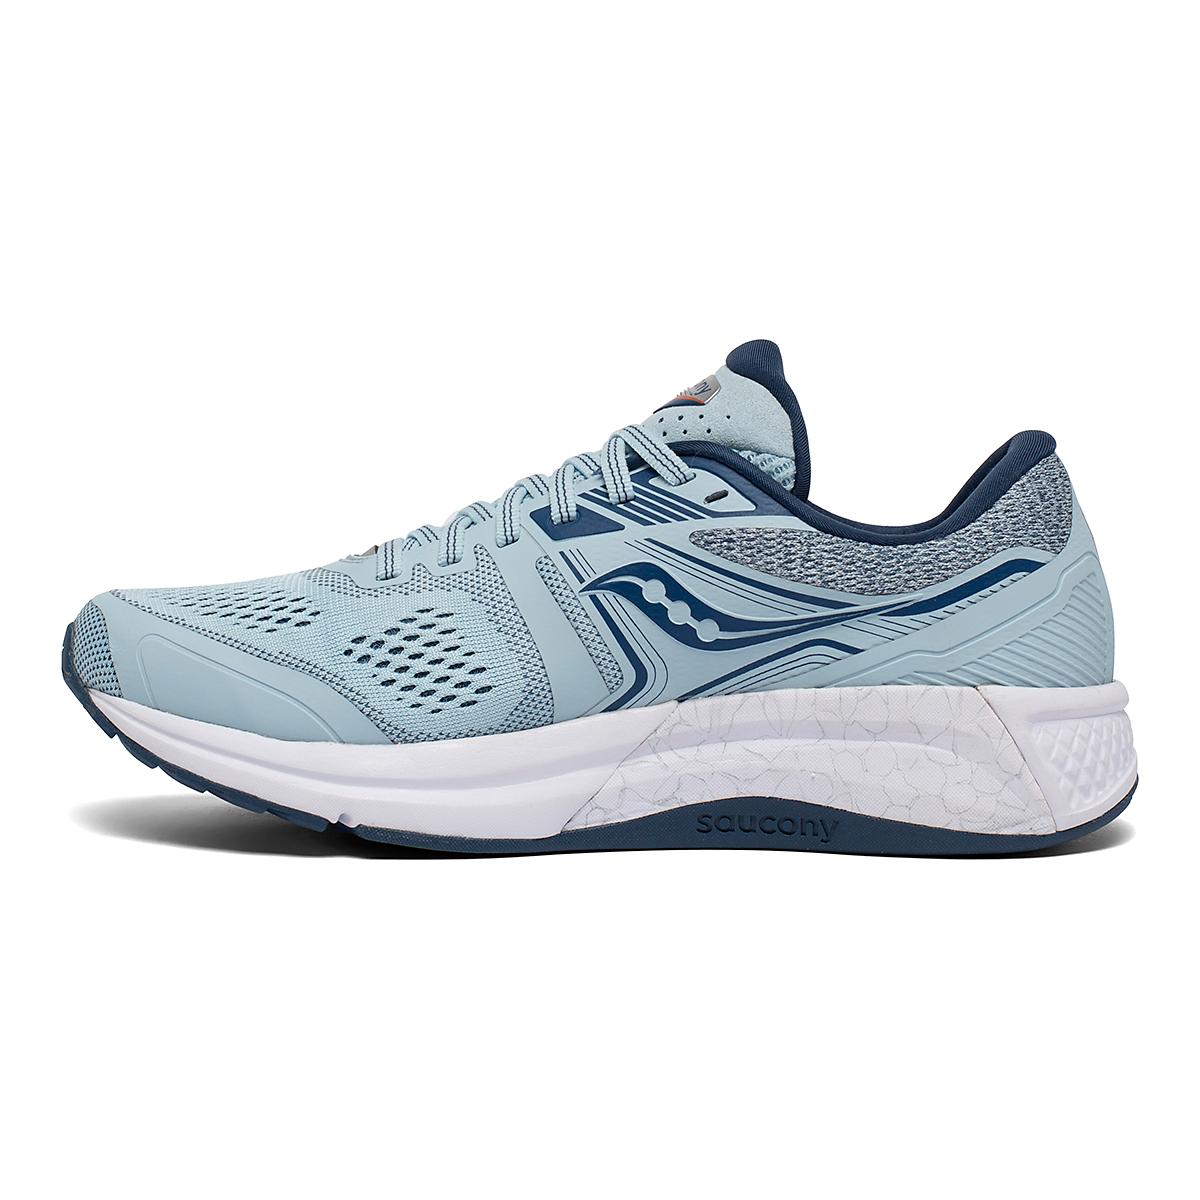 Women's Saucony Omni 19 Running Shoe - Color: Sky/Storm - Size: 5 - Width: Regular, Sky/Storm, large, image 2